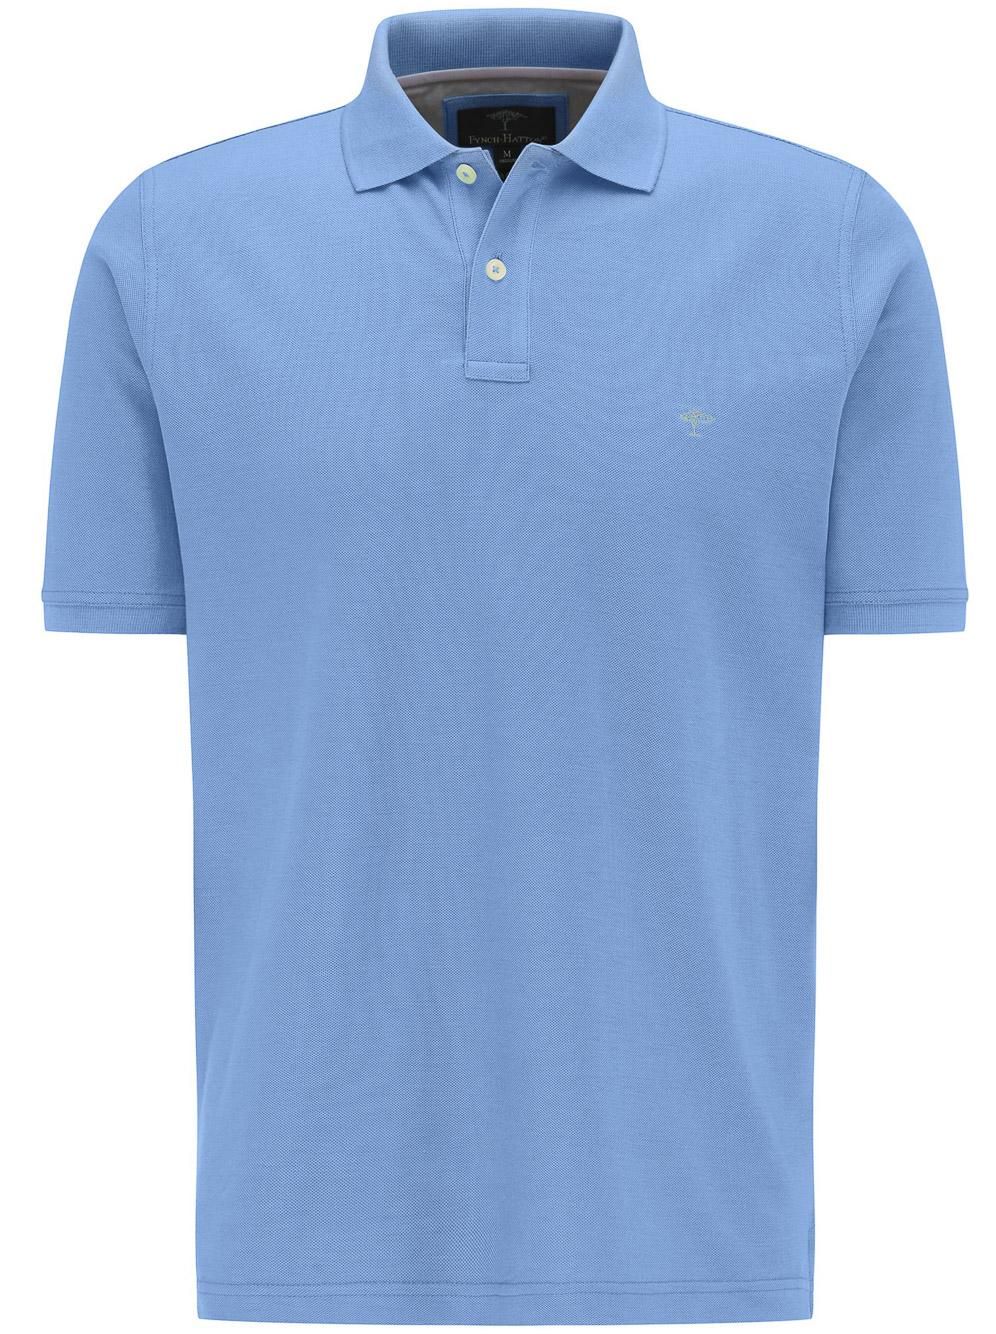 FYNCH-HATTON Μπλούζα Polo 1120 1700-614 ΓΑΛΑΖΙΟ